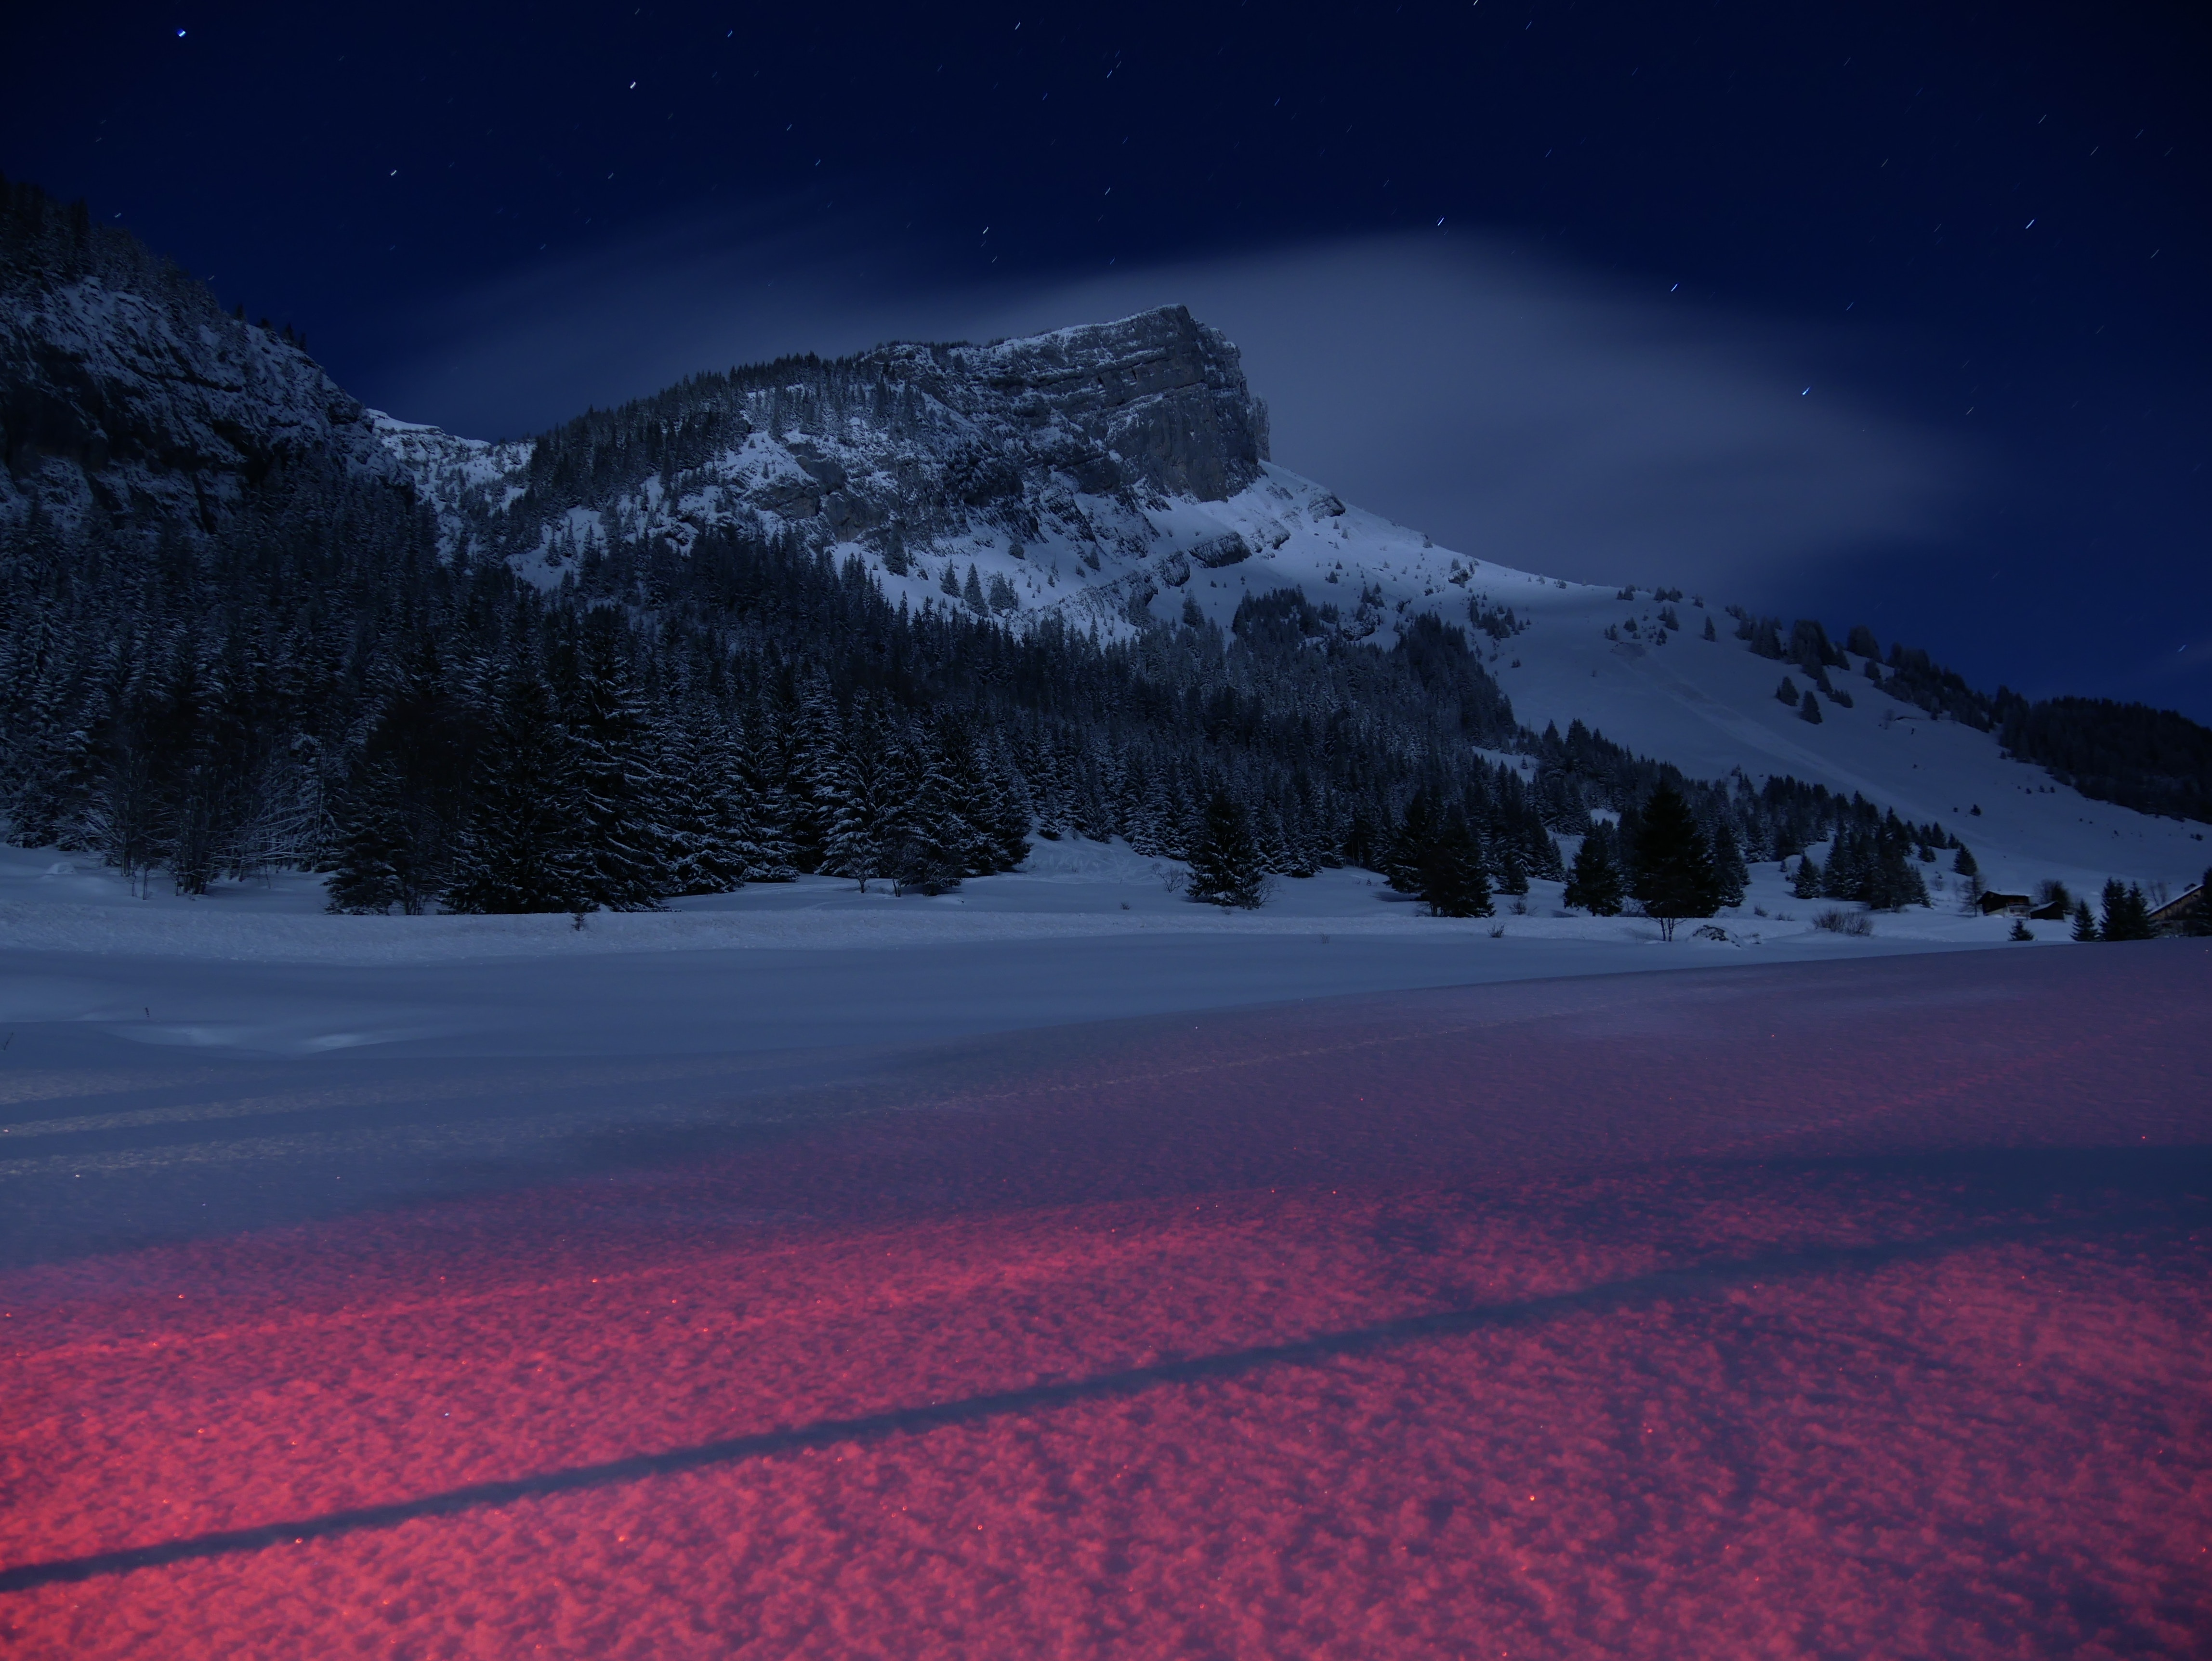 Mountains landscape night snow 5k hd nature 4k - Night mountain wallpaper 4k ...